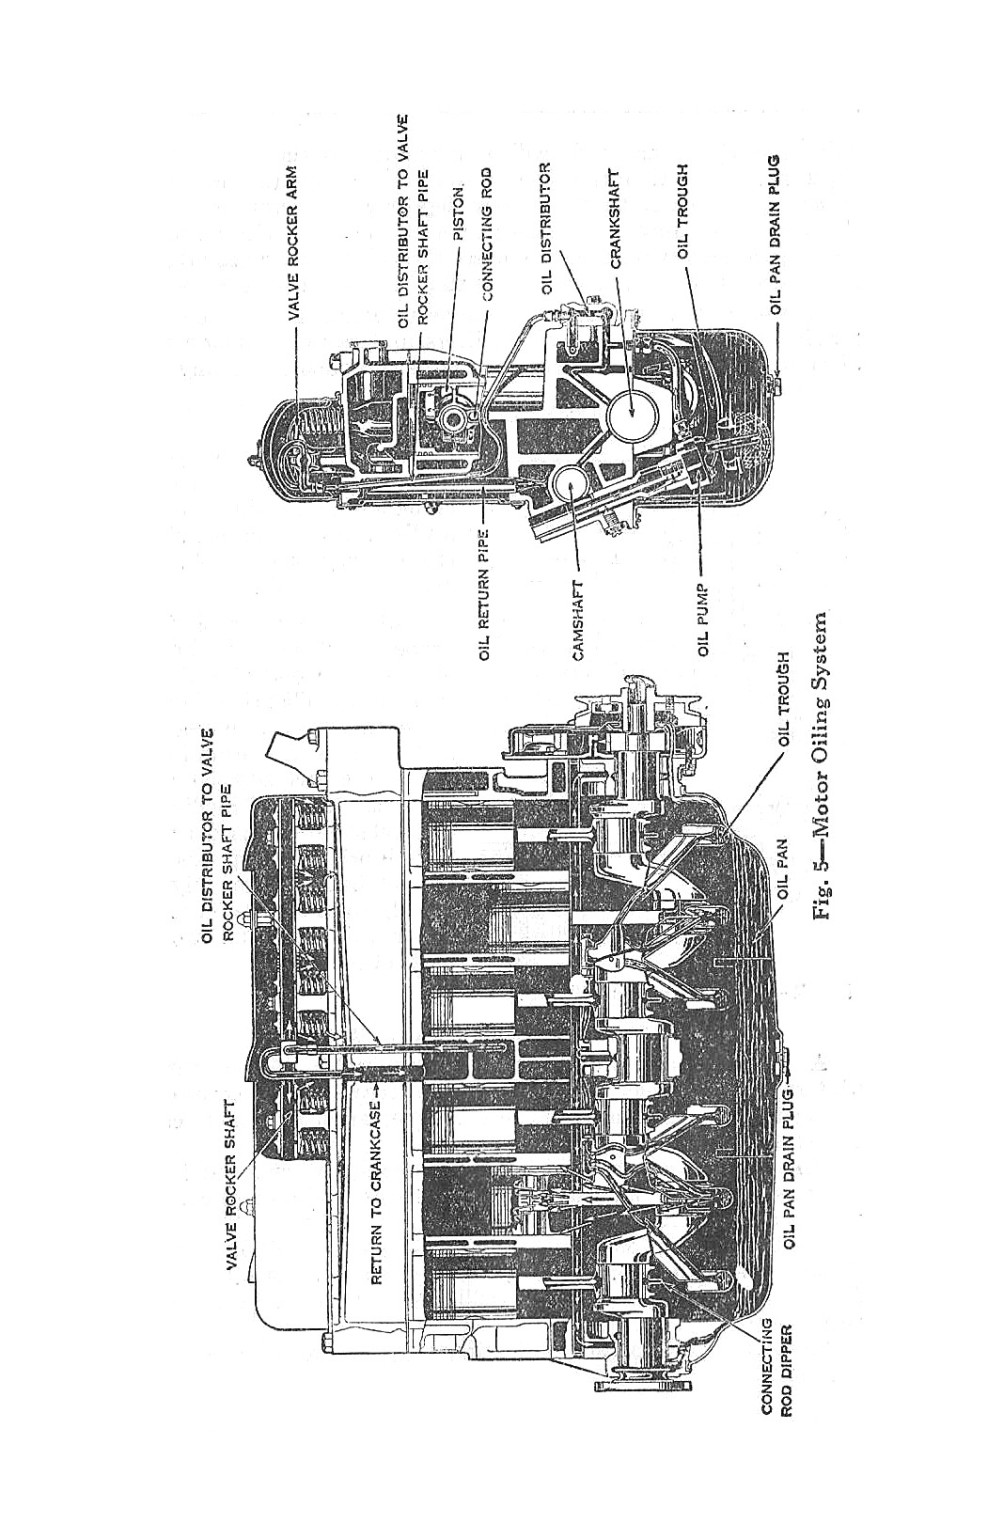 1933 Chevrolet Eagle Users Manual